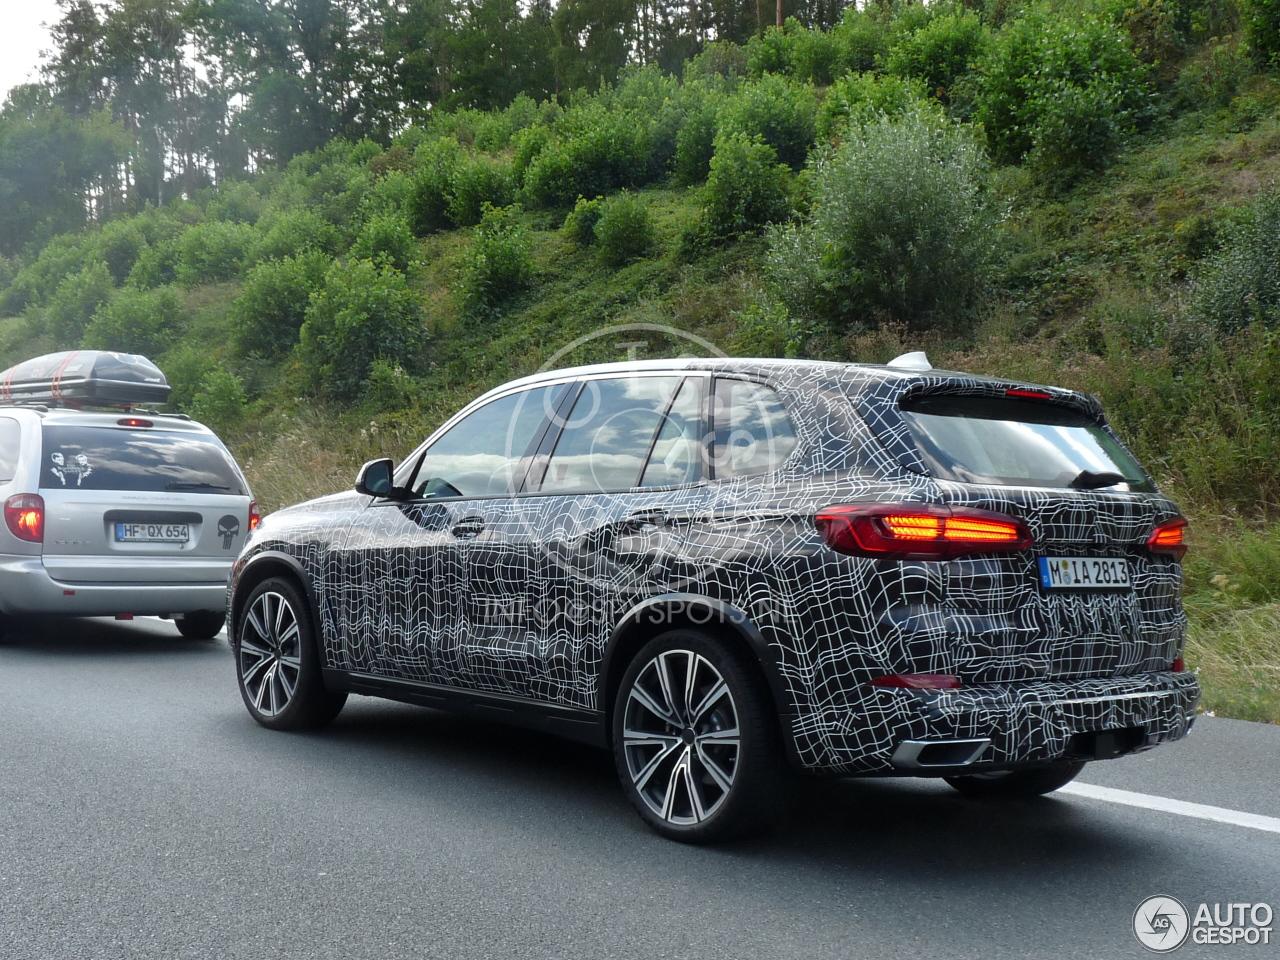 Verwonderlijk BMW X5 G05 - 19 August 2018 - Autogespot EH-95